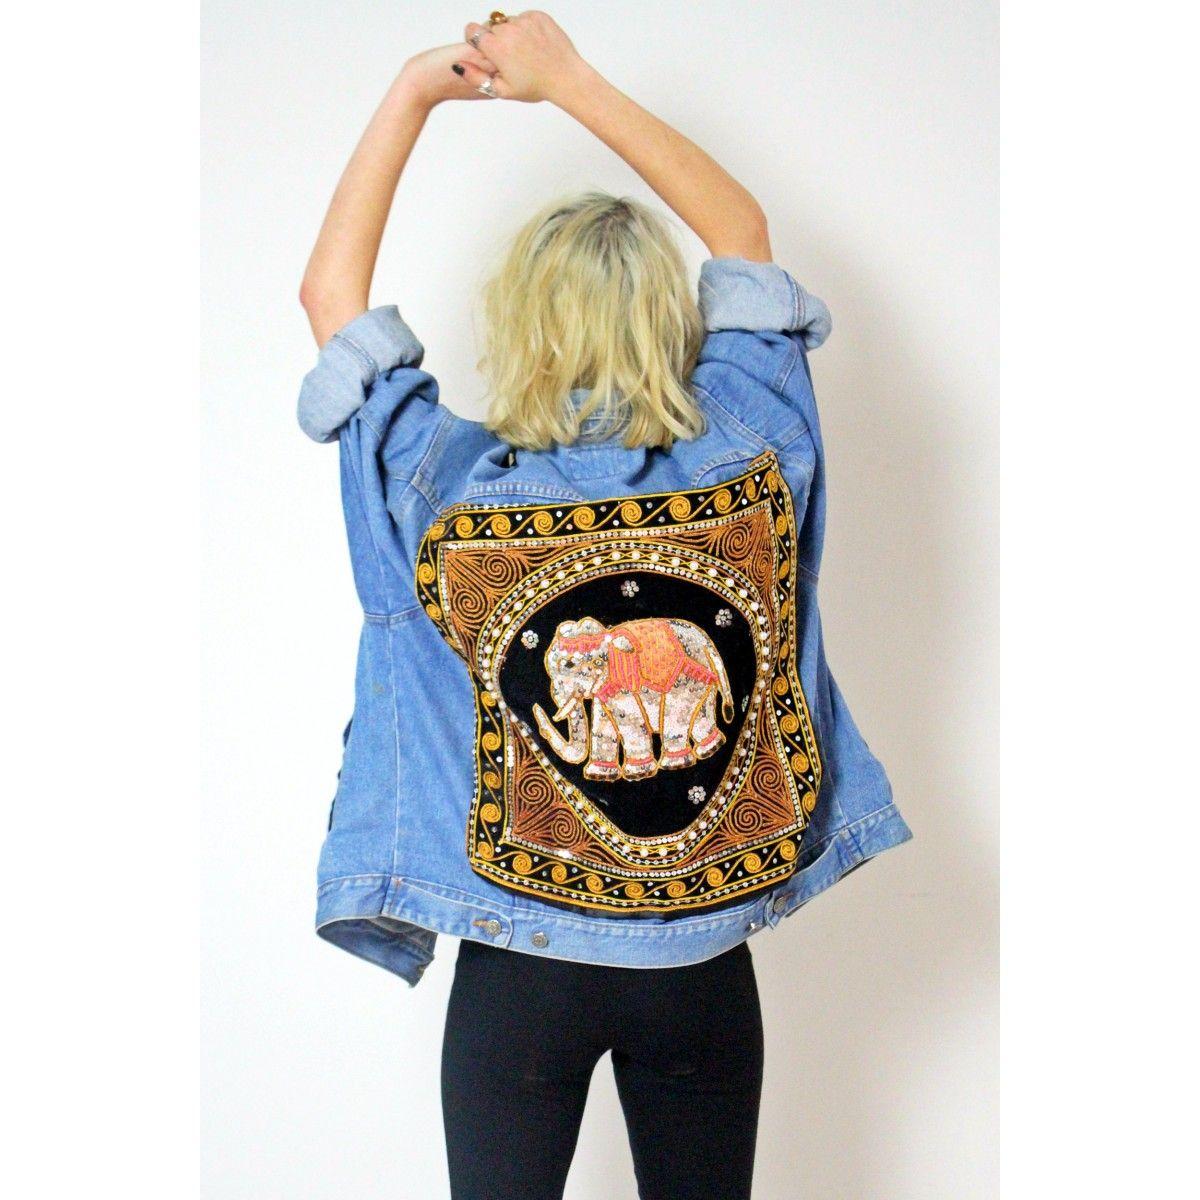 WE KOKO Fashion   Delinquent Denim Elephant Jacket   Top Fashion ...